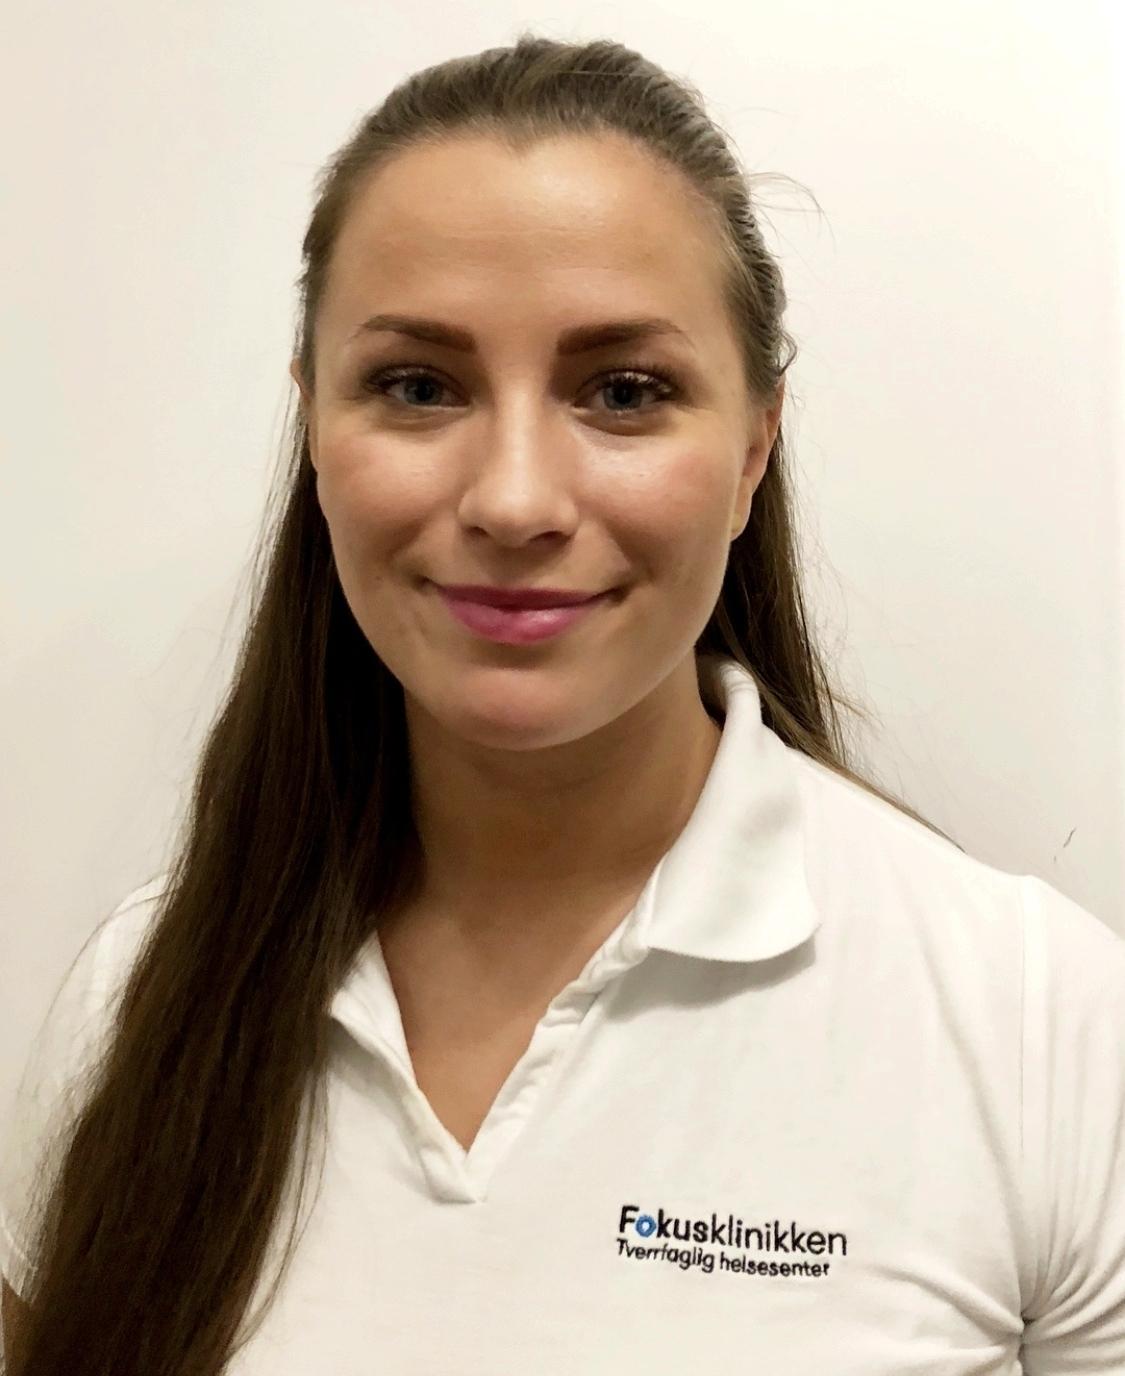 Osteopat Sandra Gavrilov, starter på Fokusklinikken i uke 50. FOTO: Fokusklinikken